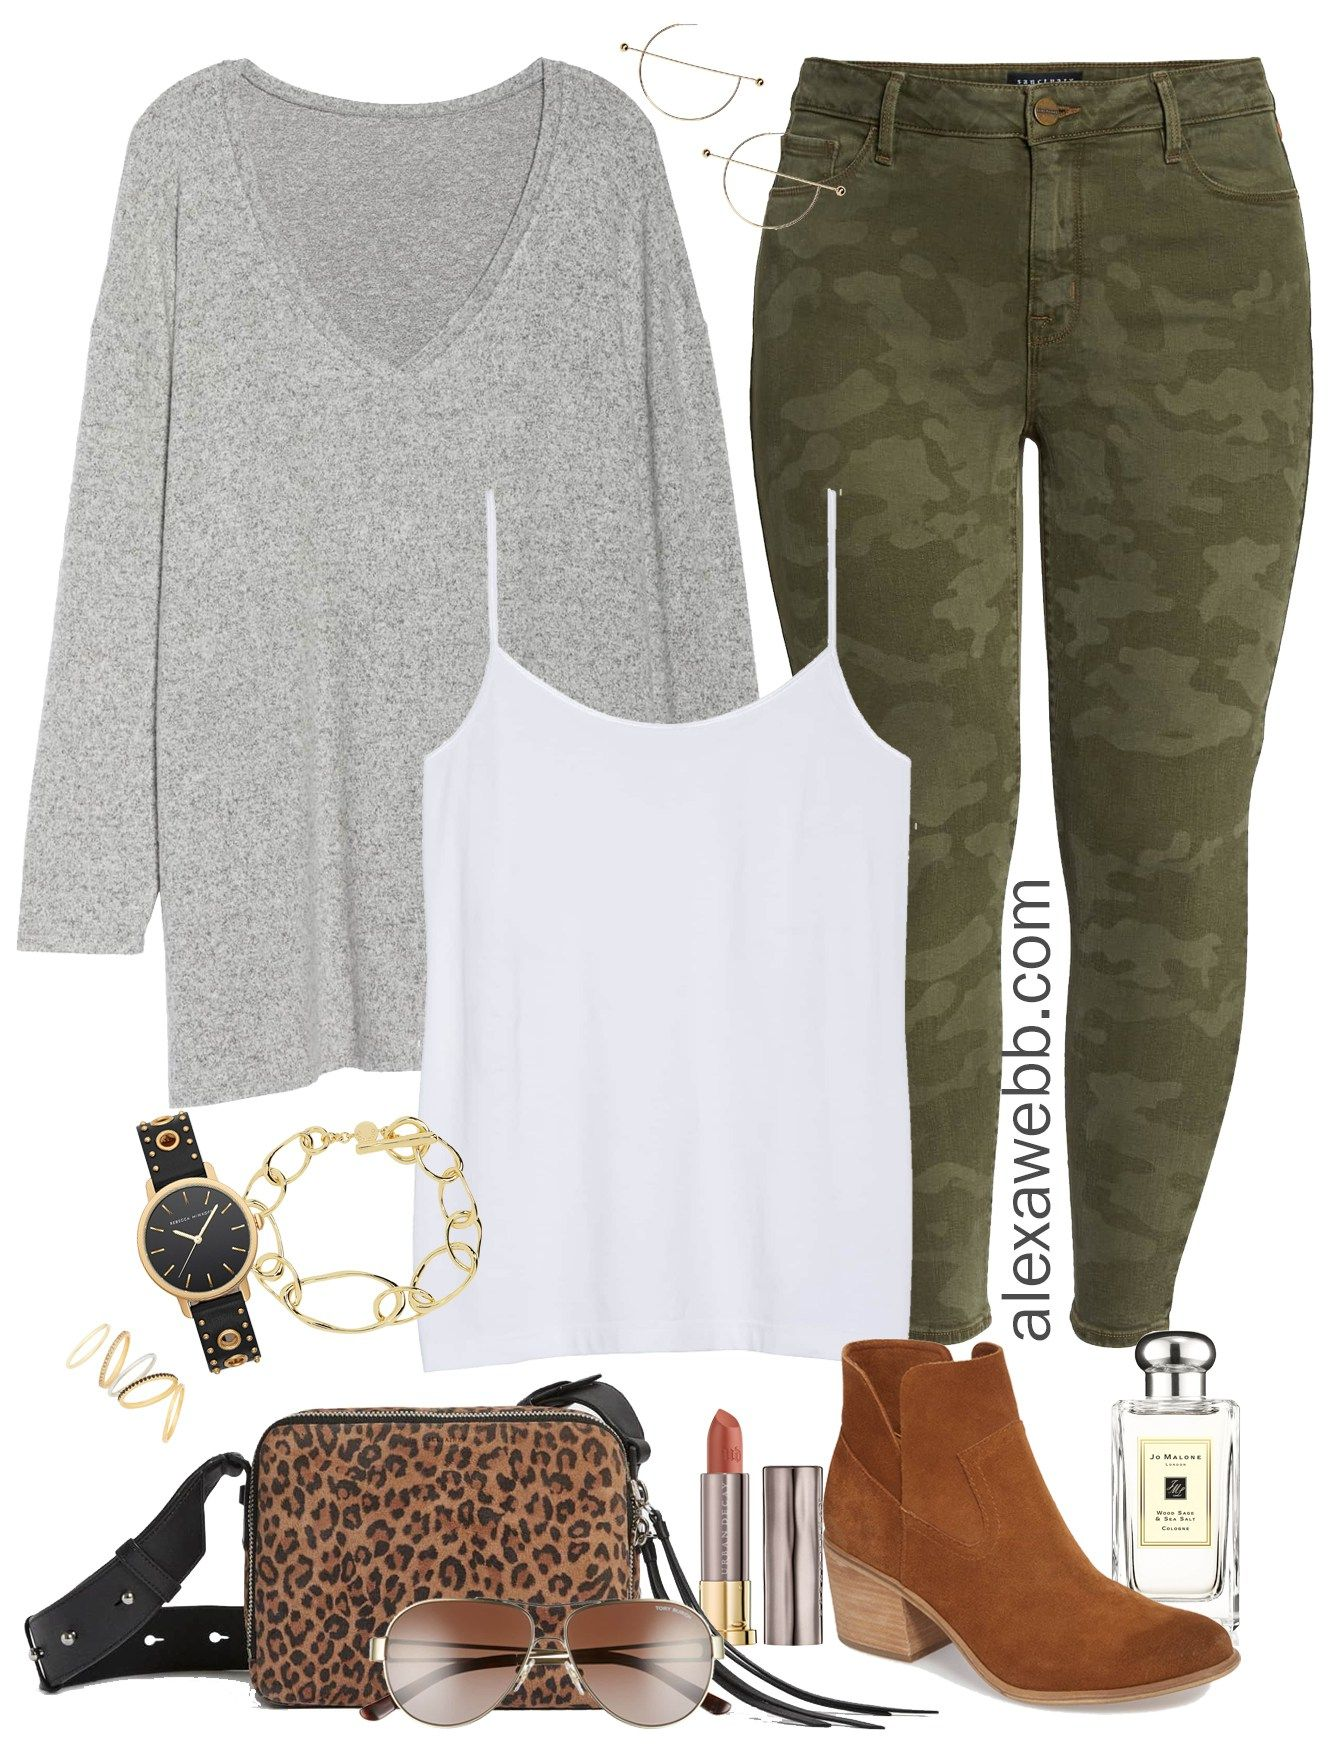 406be50ea2f Plus Size Camo Pants - Plus Size Nordstom Sale Picks - Plus Size Fashion  for Women - alexawebb.com  plussize  alexawebb